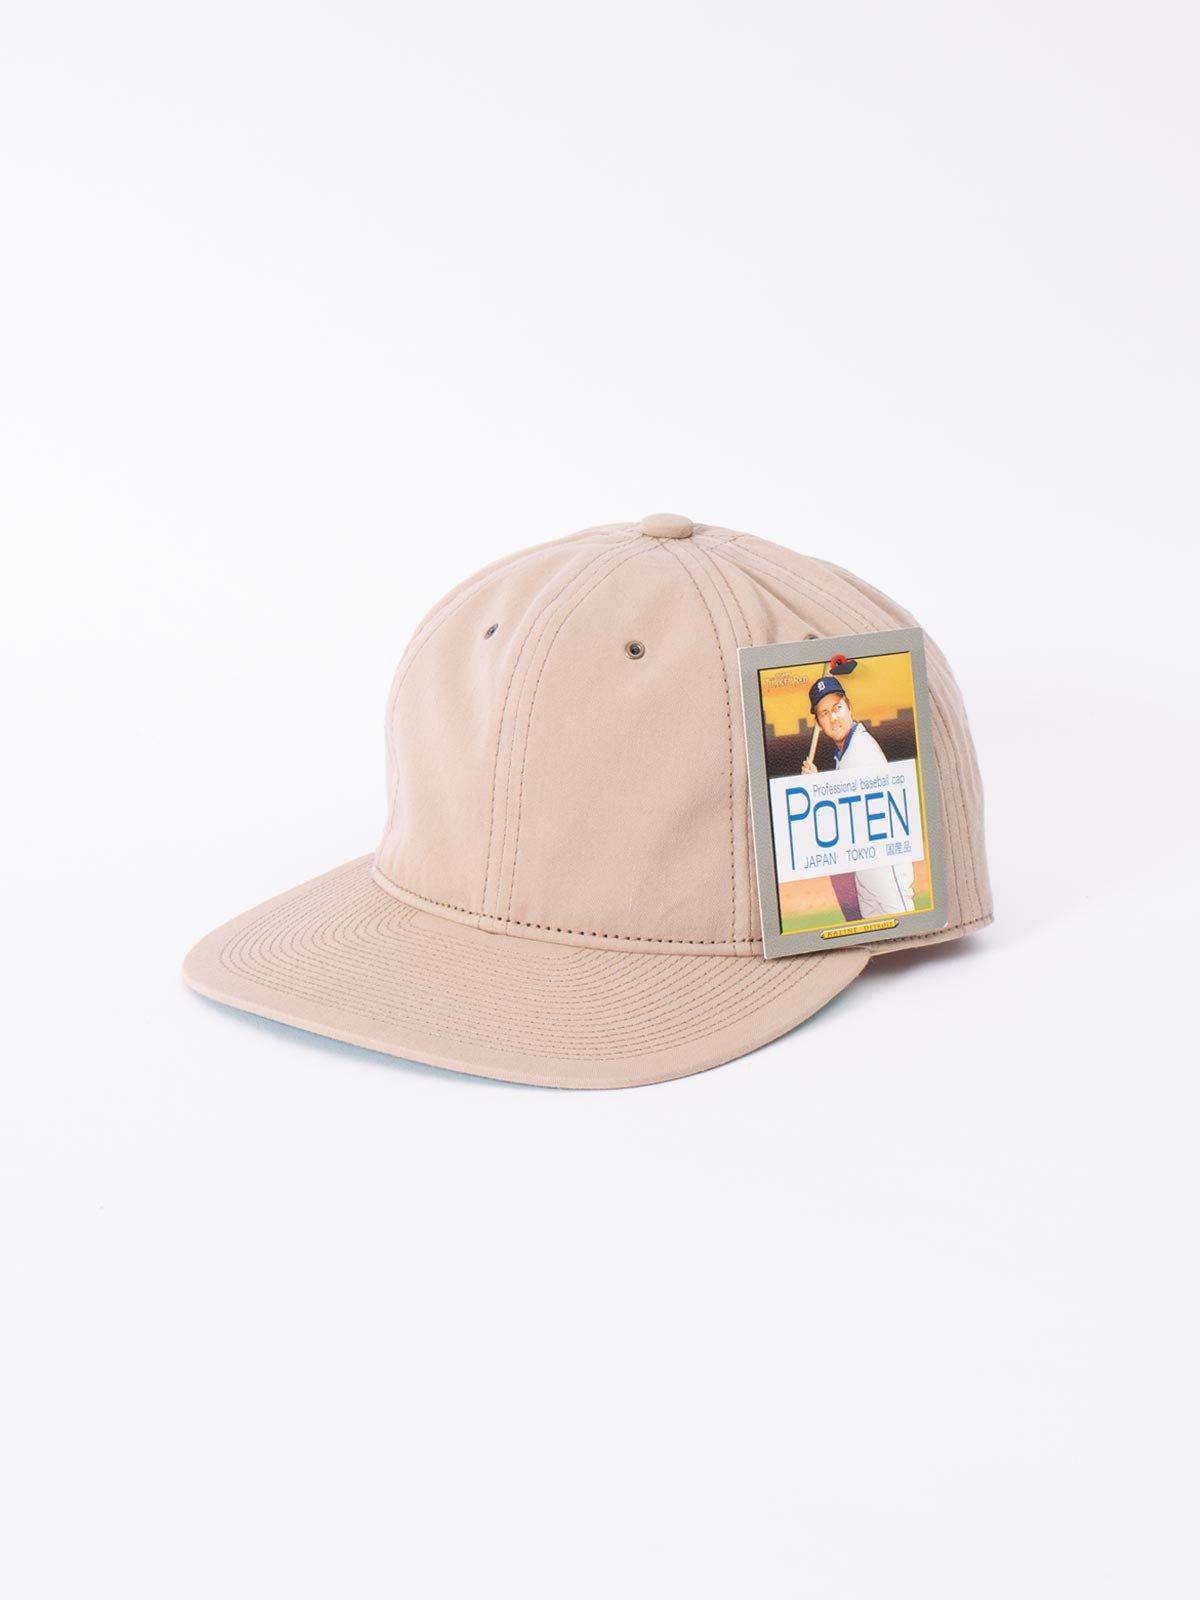 BEIGE WASHED COTTON CAP - Image 1